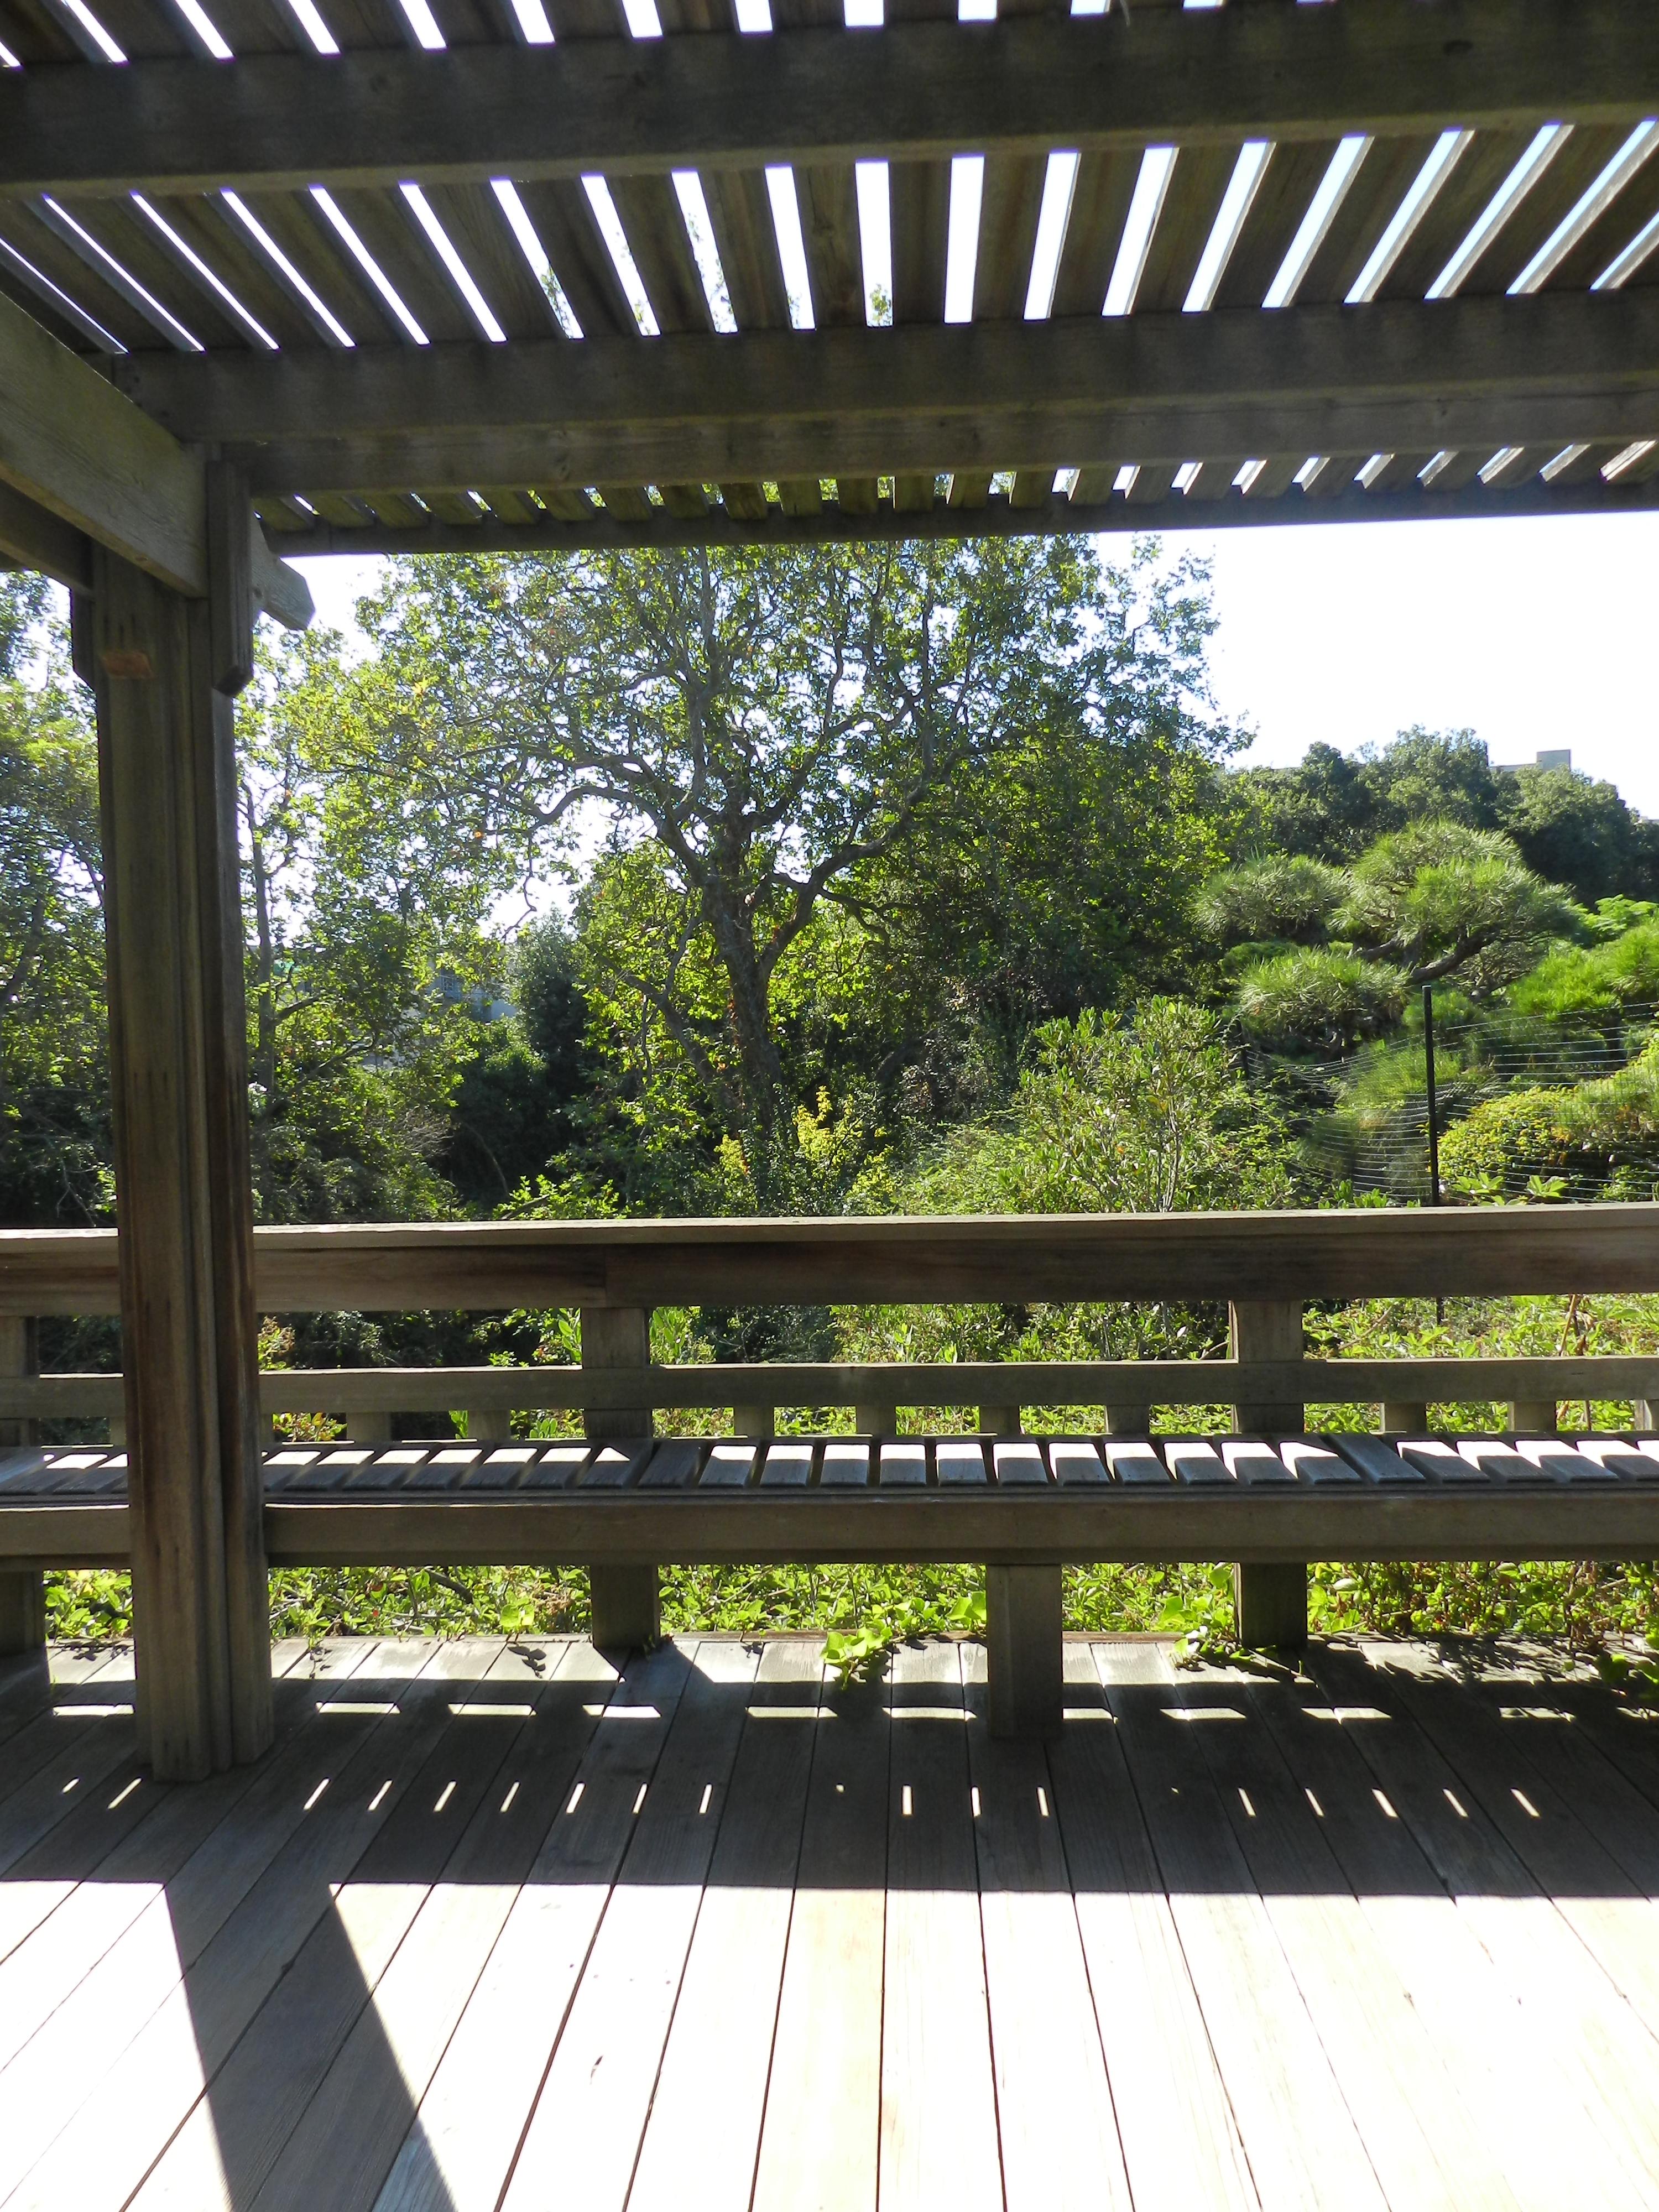 File:Japanese Gardens from observation deck Hayward.jpg - Wikimedia ...